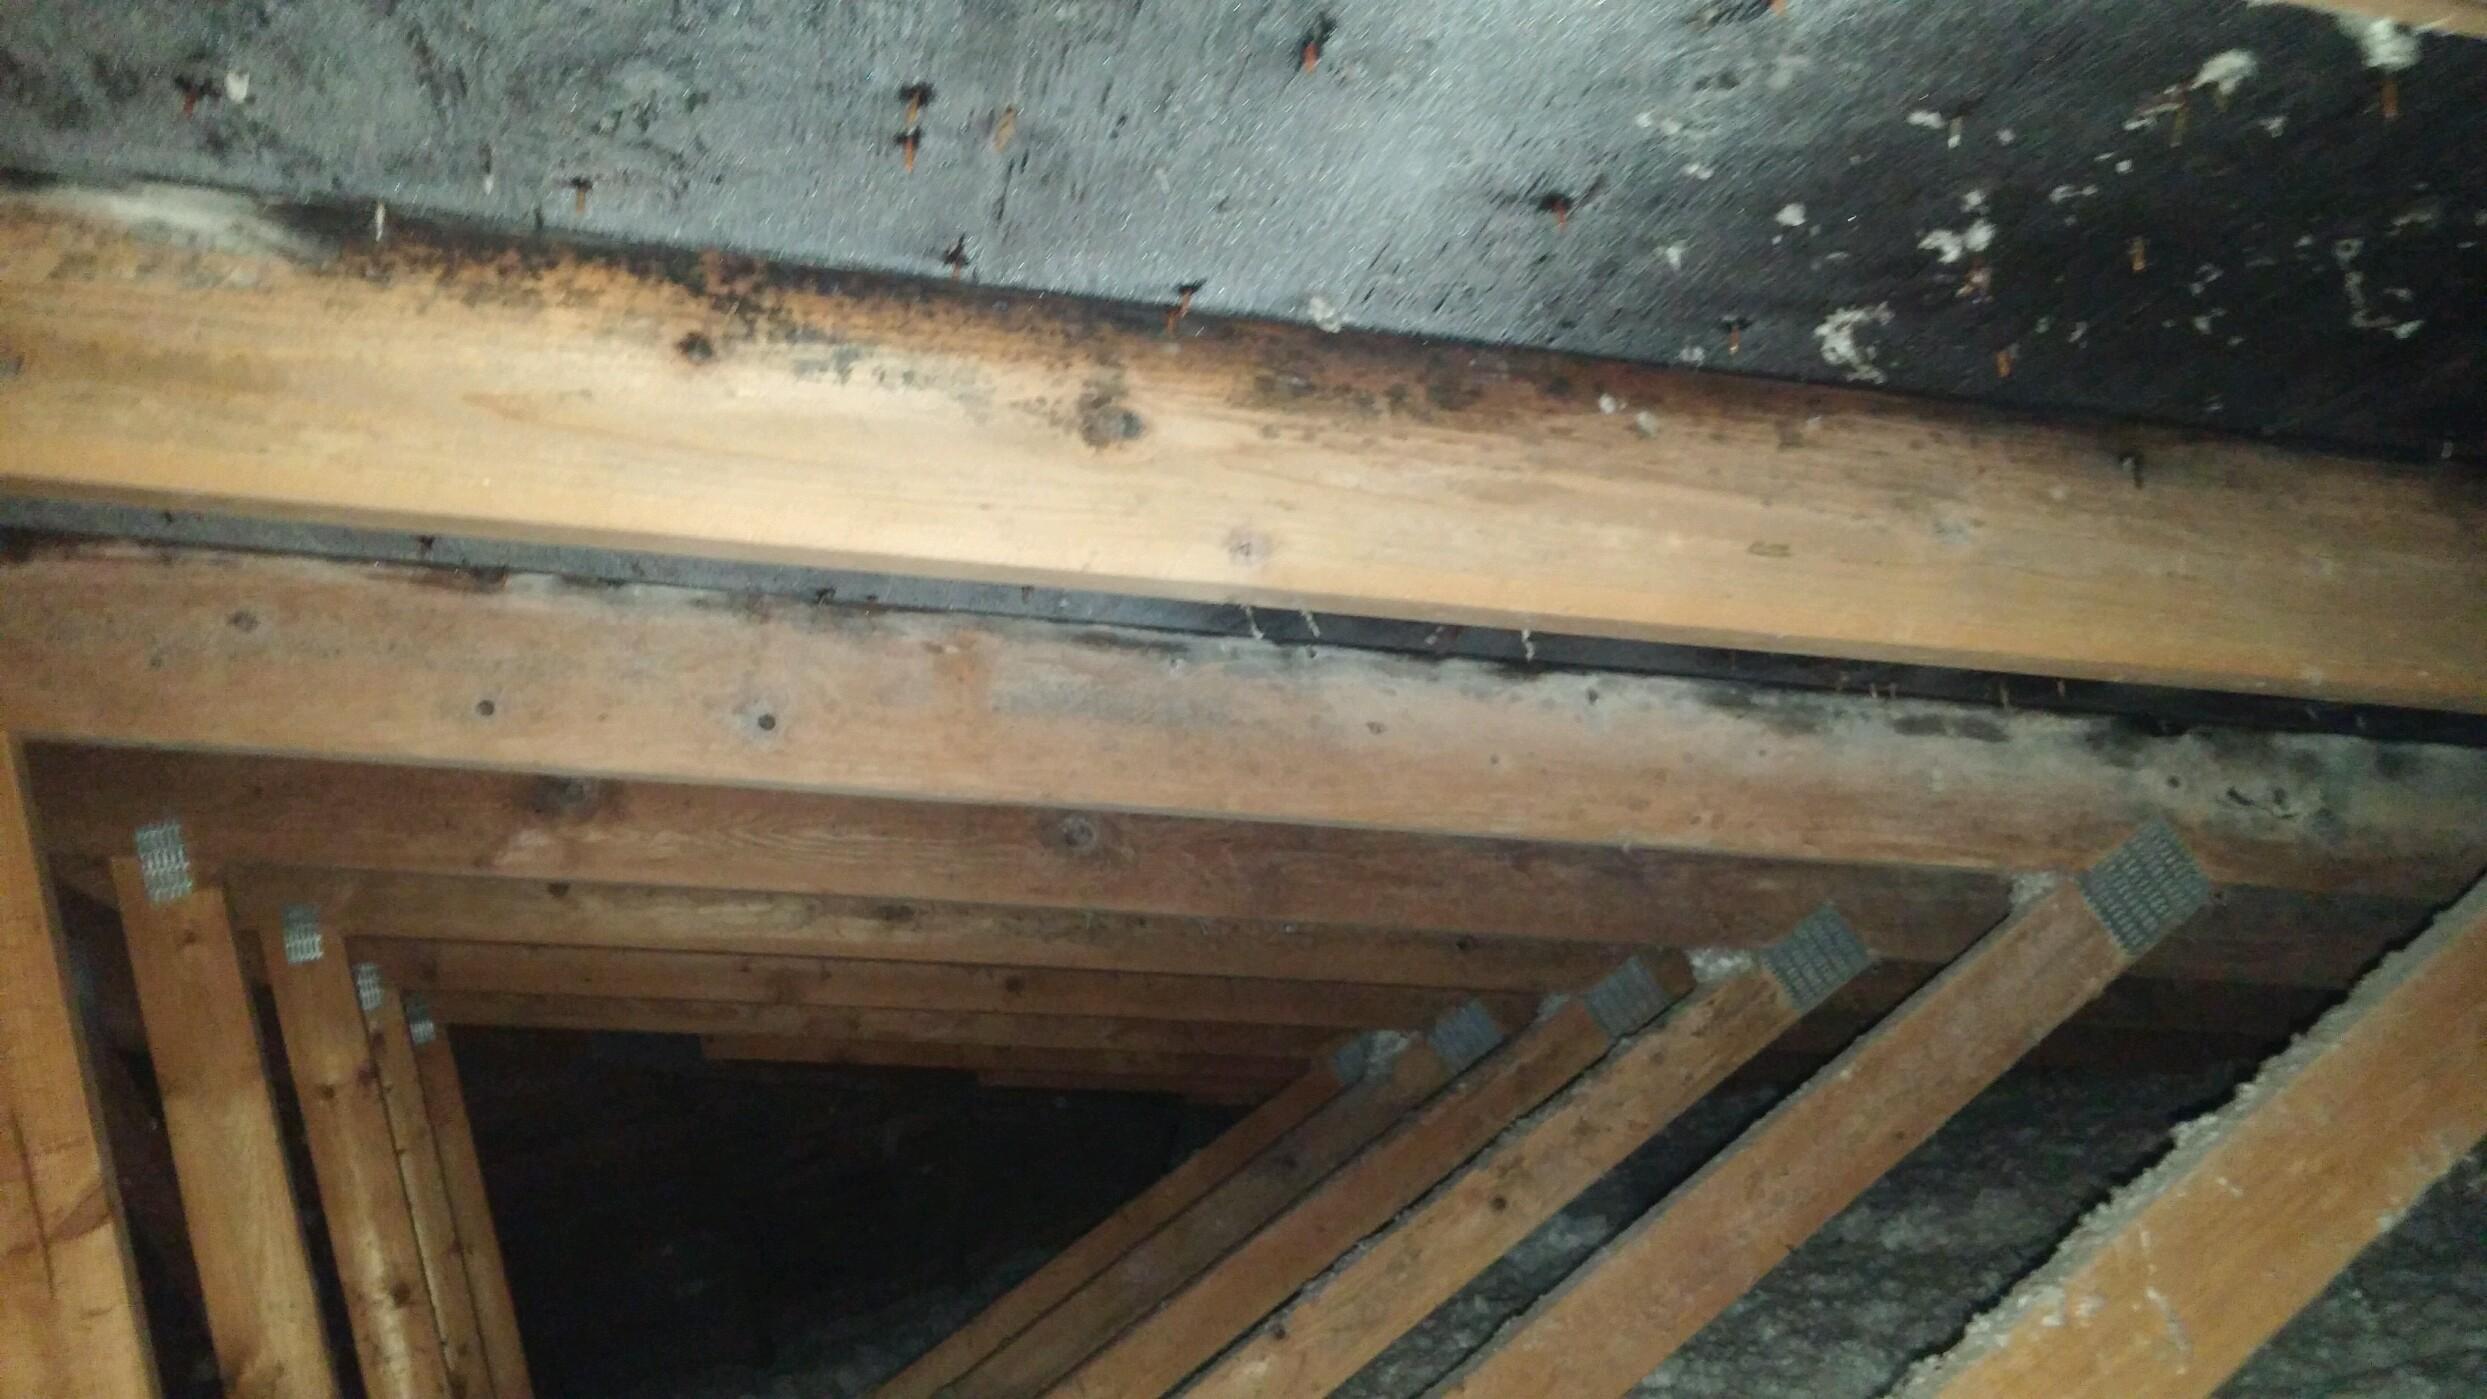 Mold Removal Towson